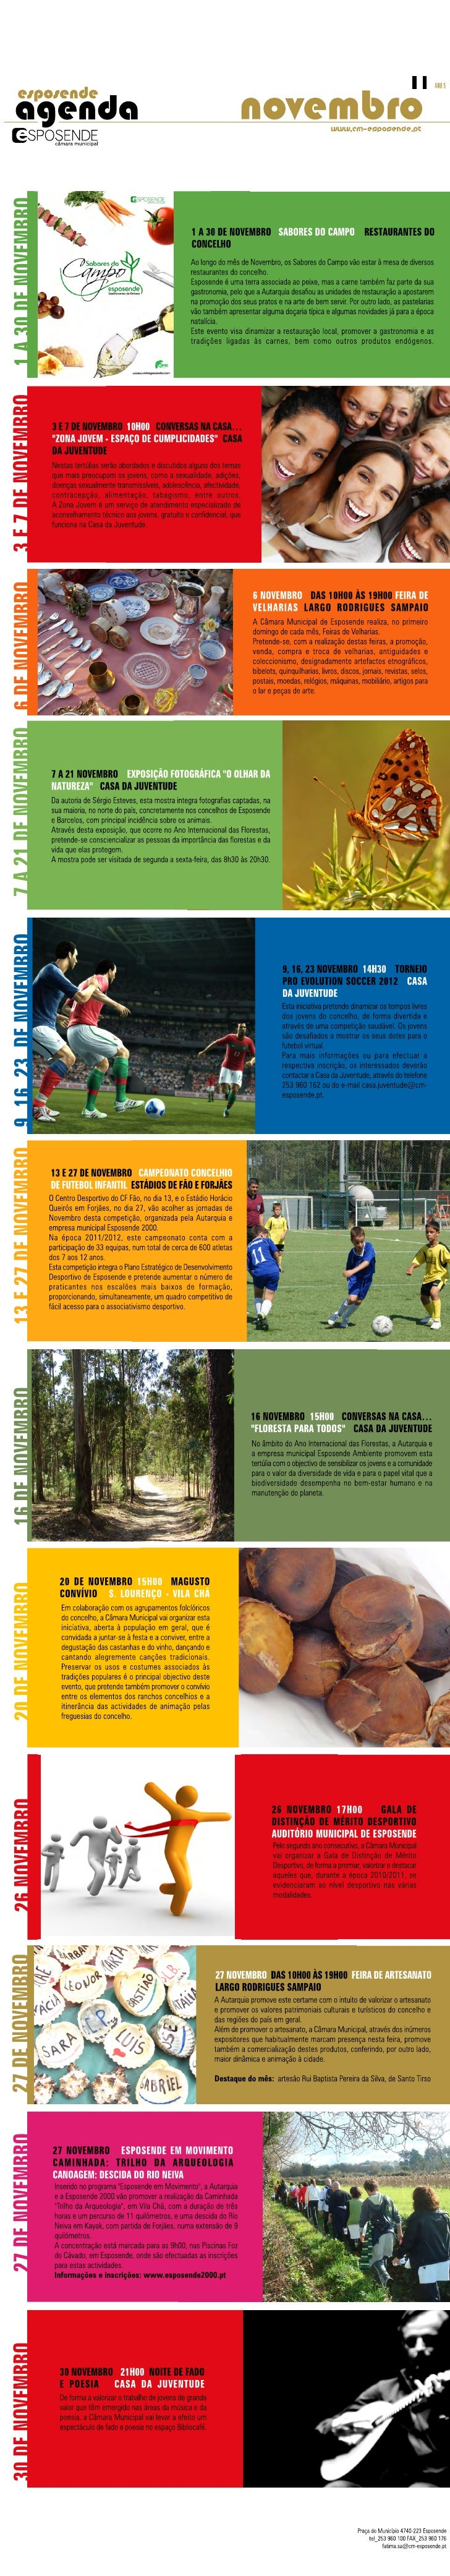 Agenda novembro-2011